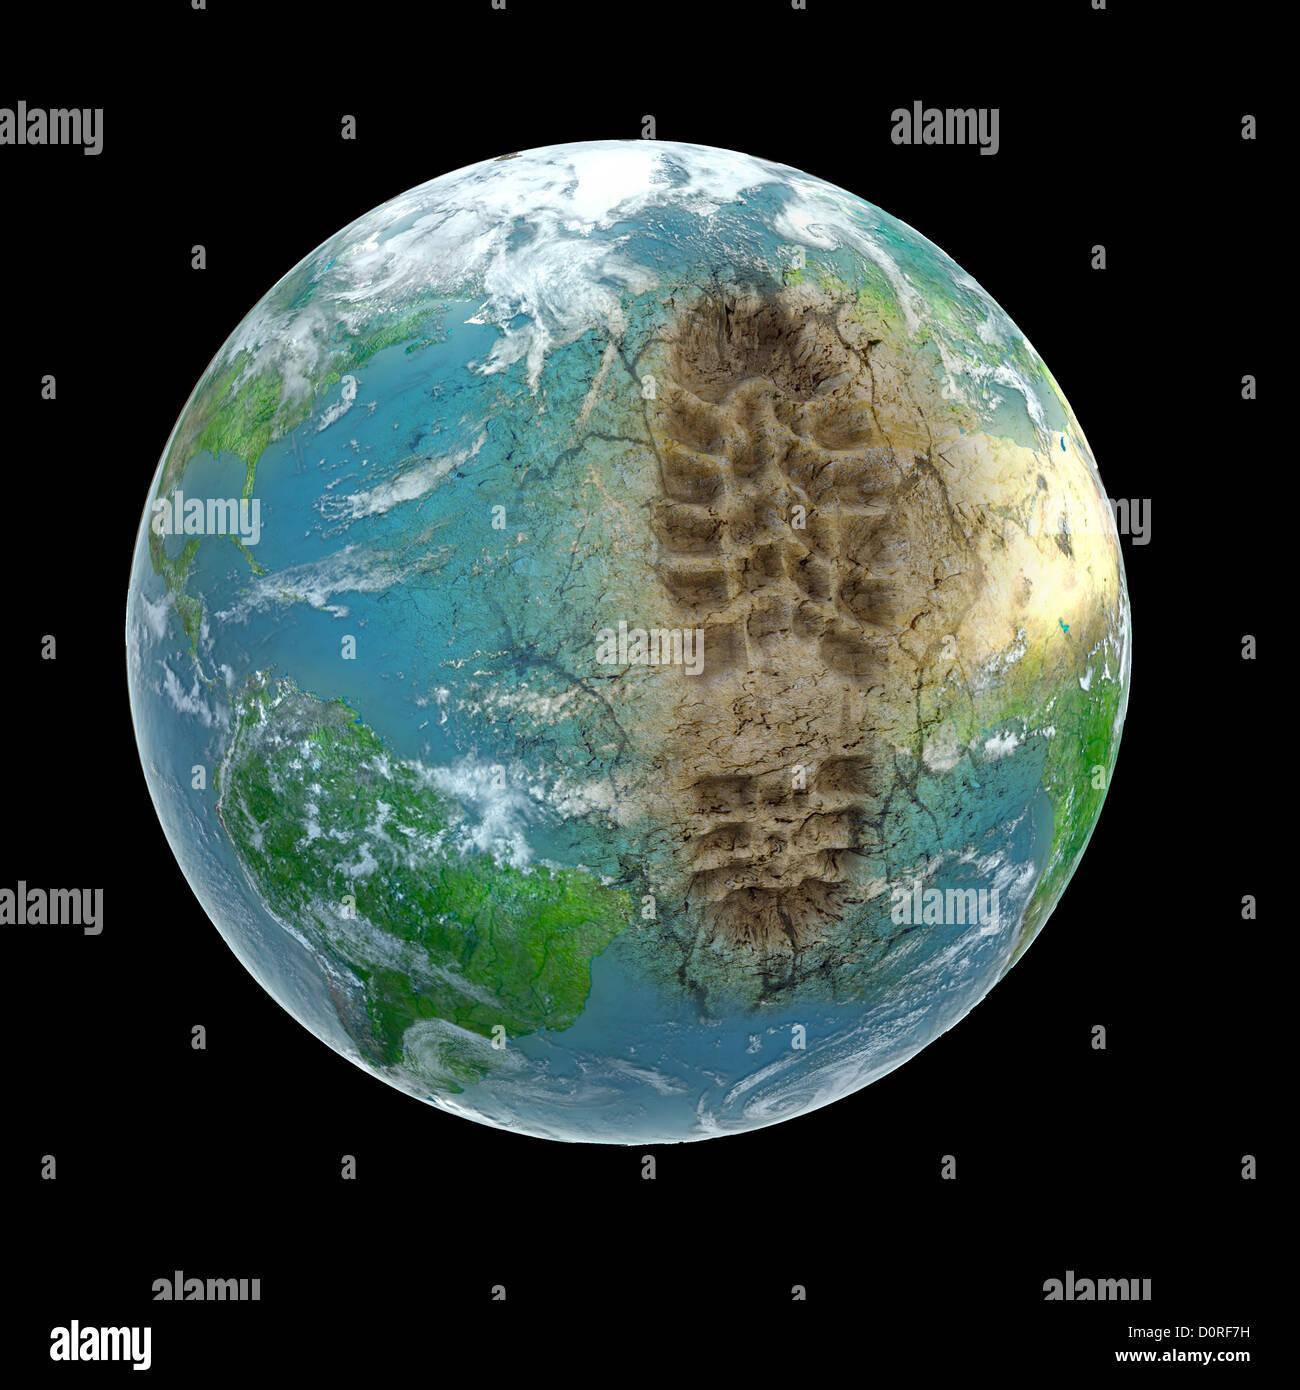 Huella ecológica Imagen De Stock